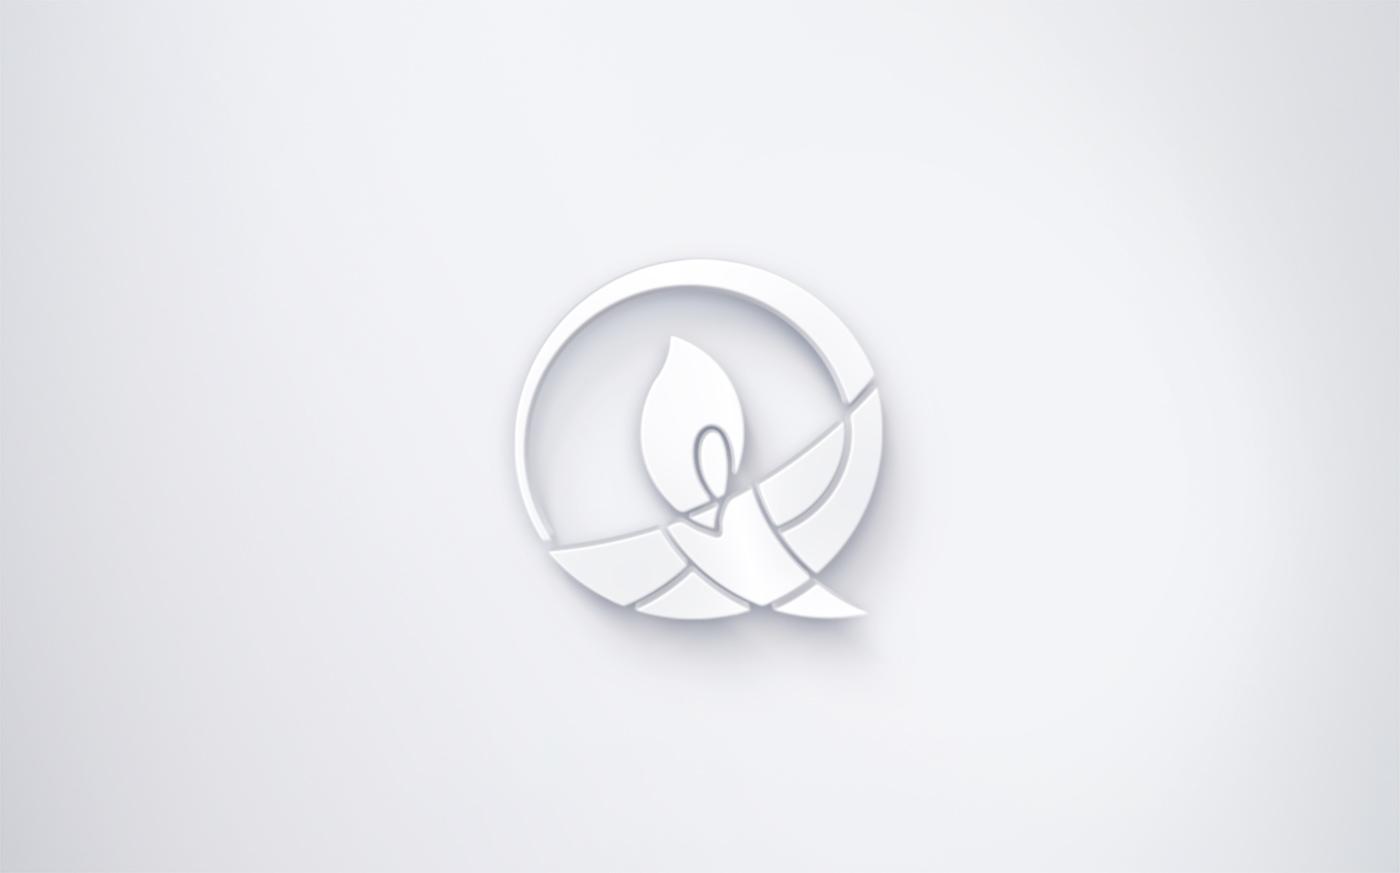 energies energy Gas bird flame firebird colors logo electric identity power